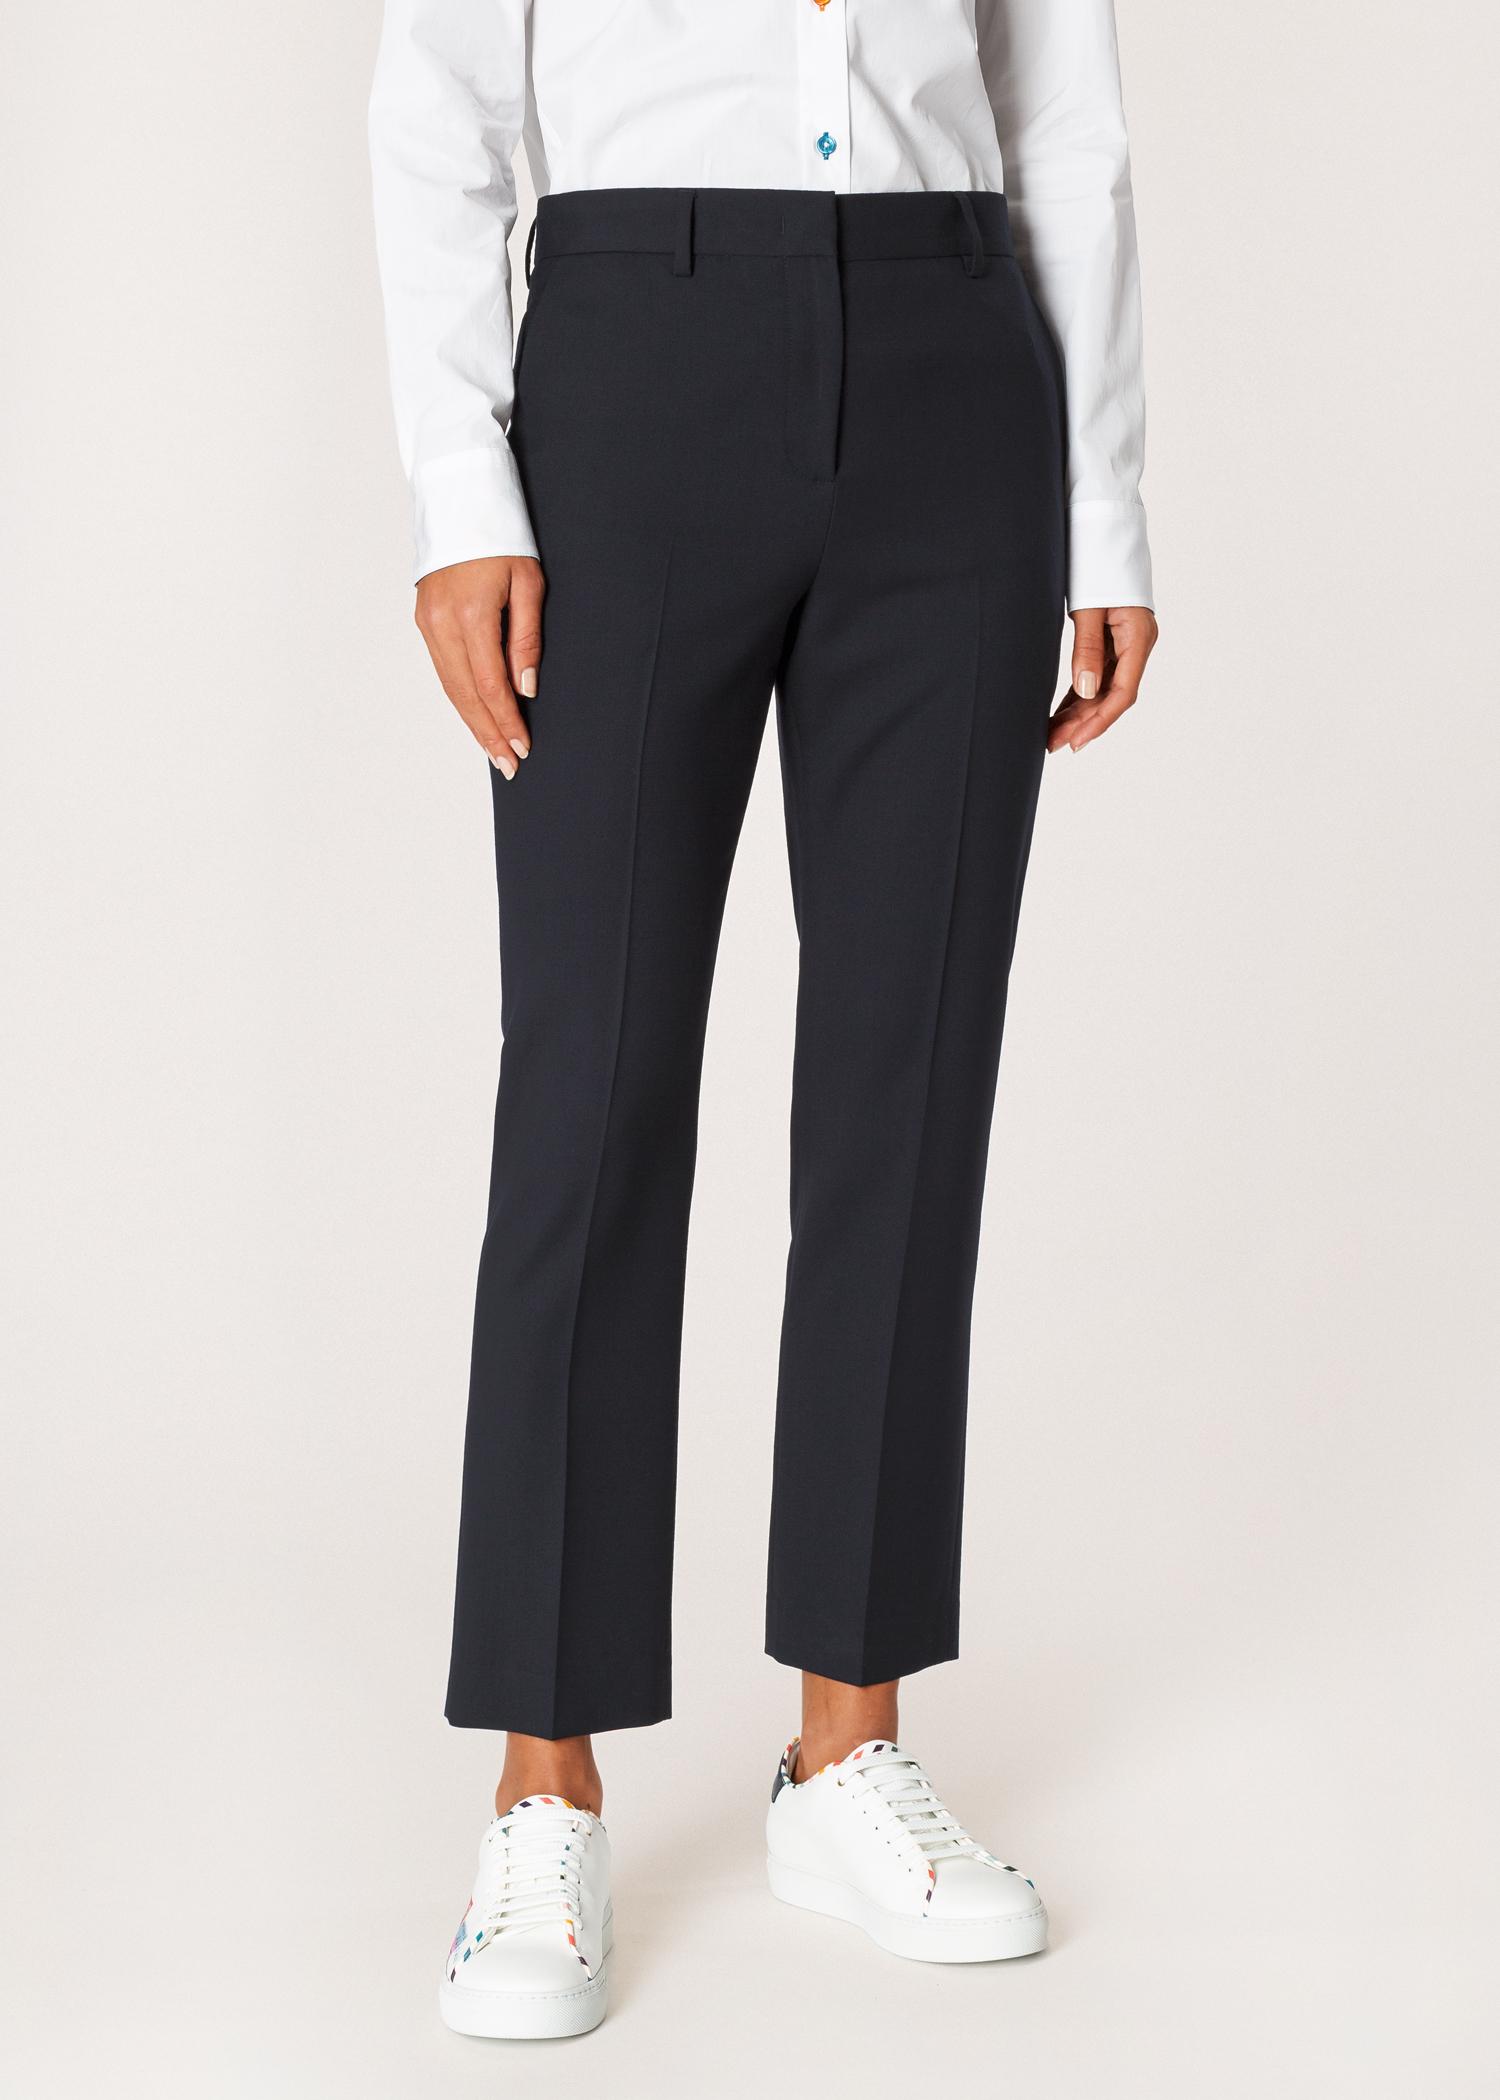 3f1f1d690b5 A Suit To Travel In - Women's Slim-Fit Navy Wool Pants - Paul Smith US